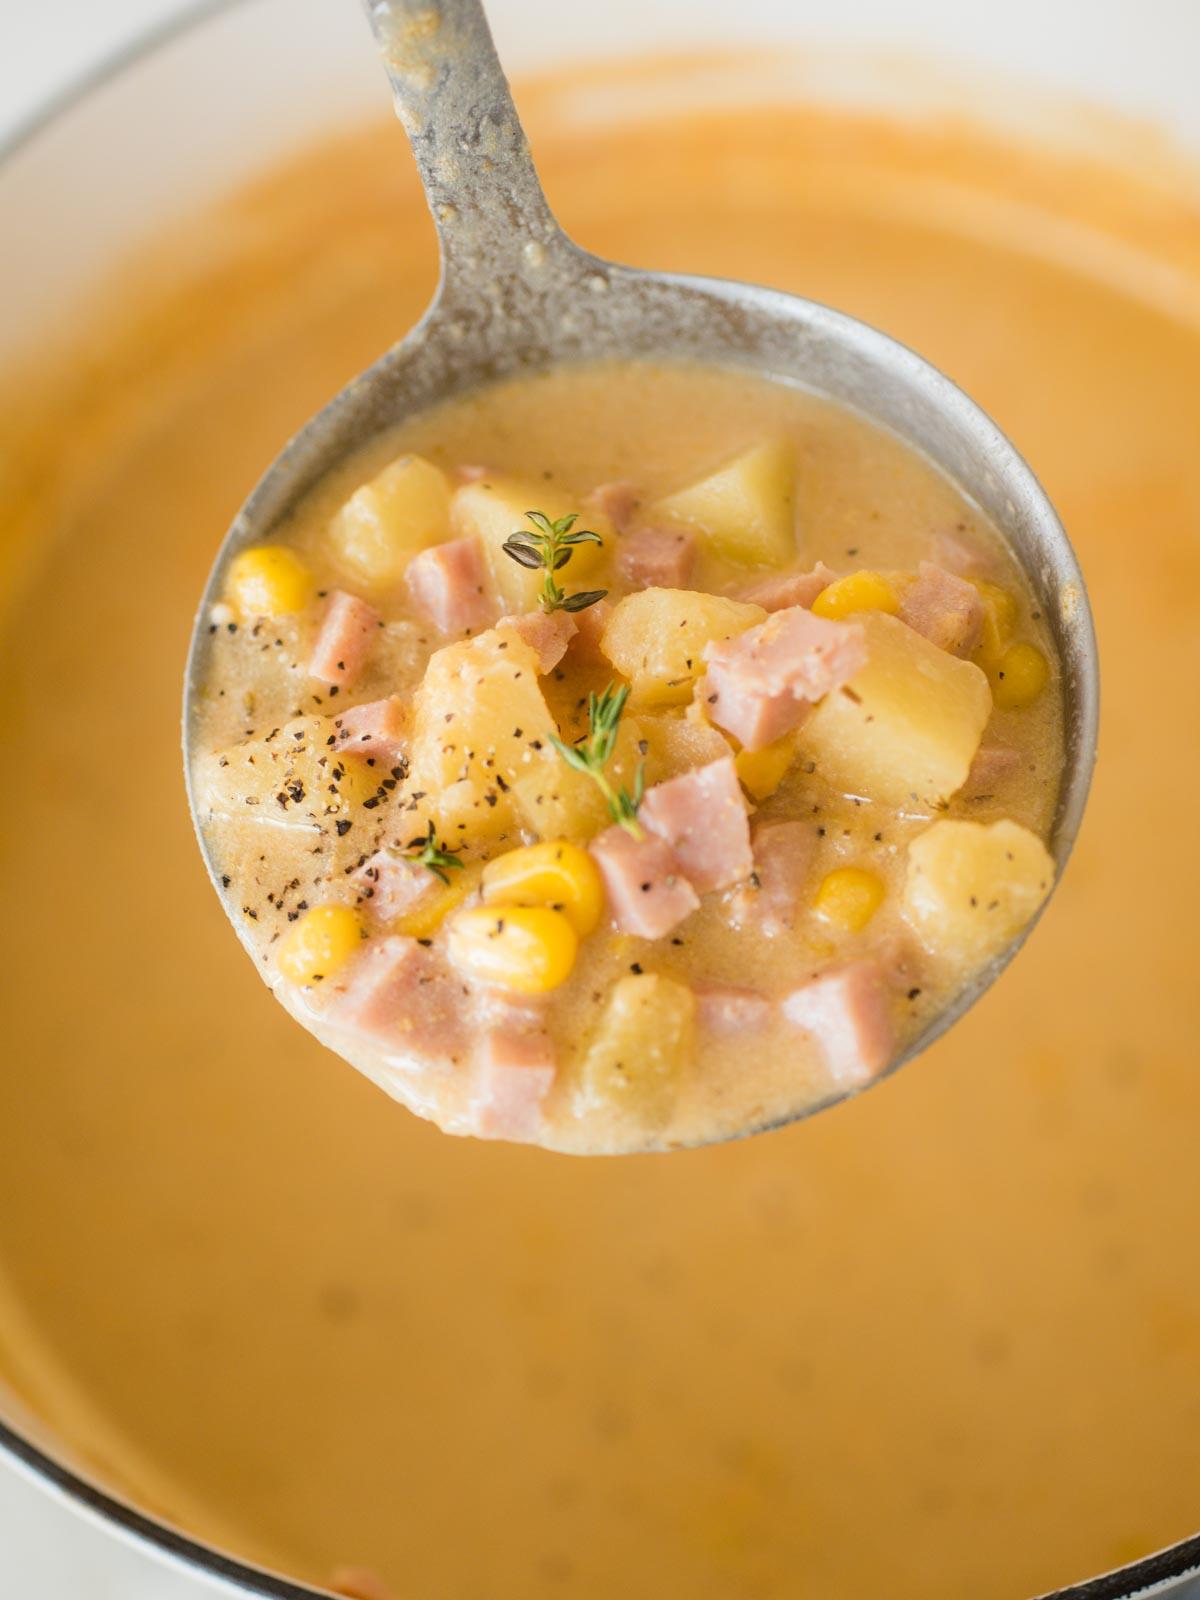 ladel full of creamy ham and potato corn chowder